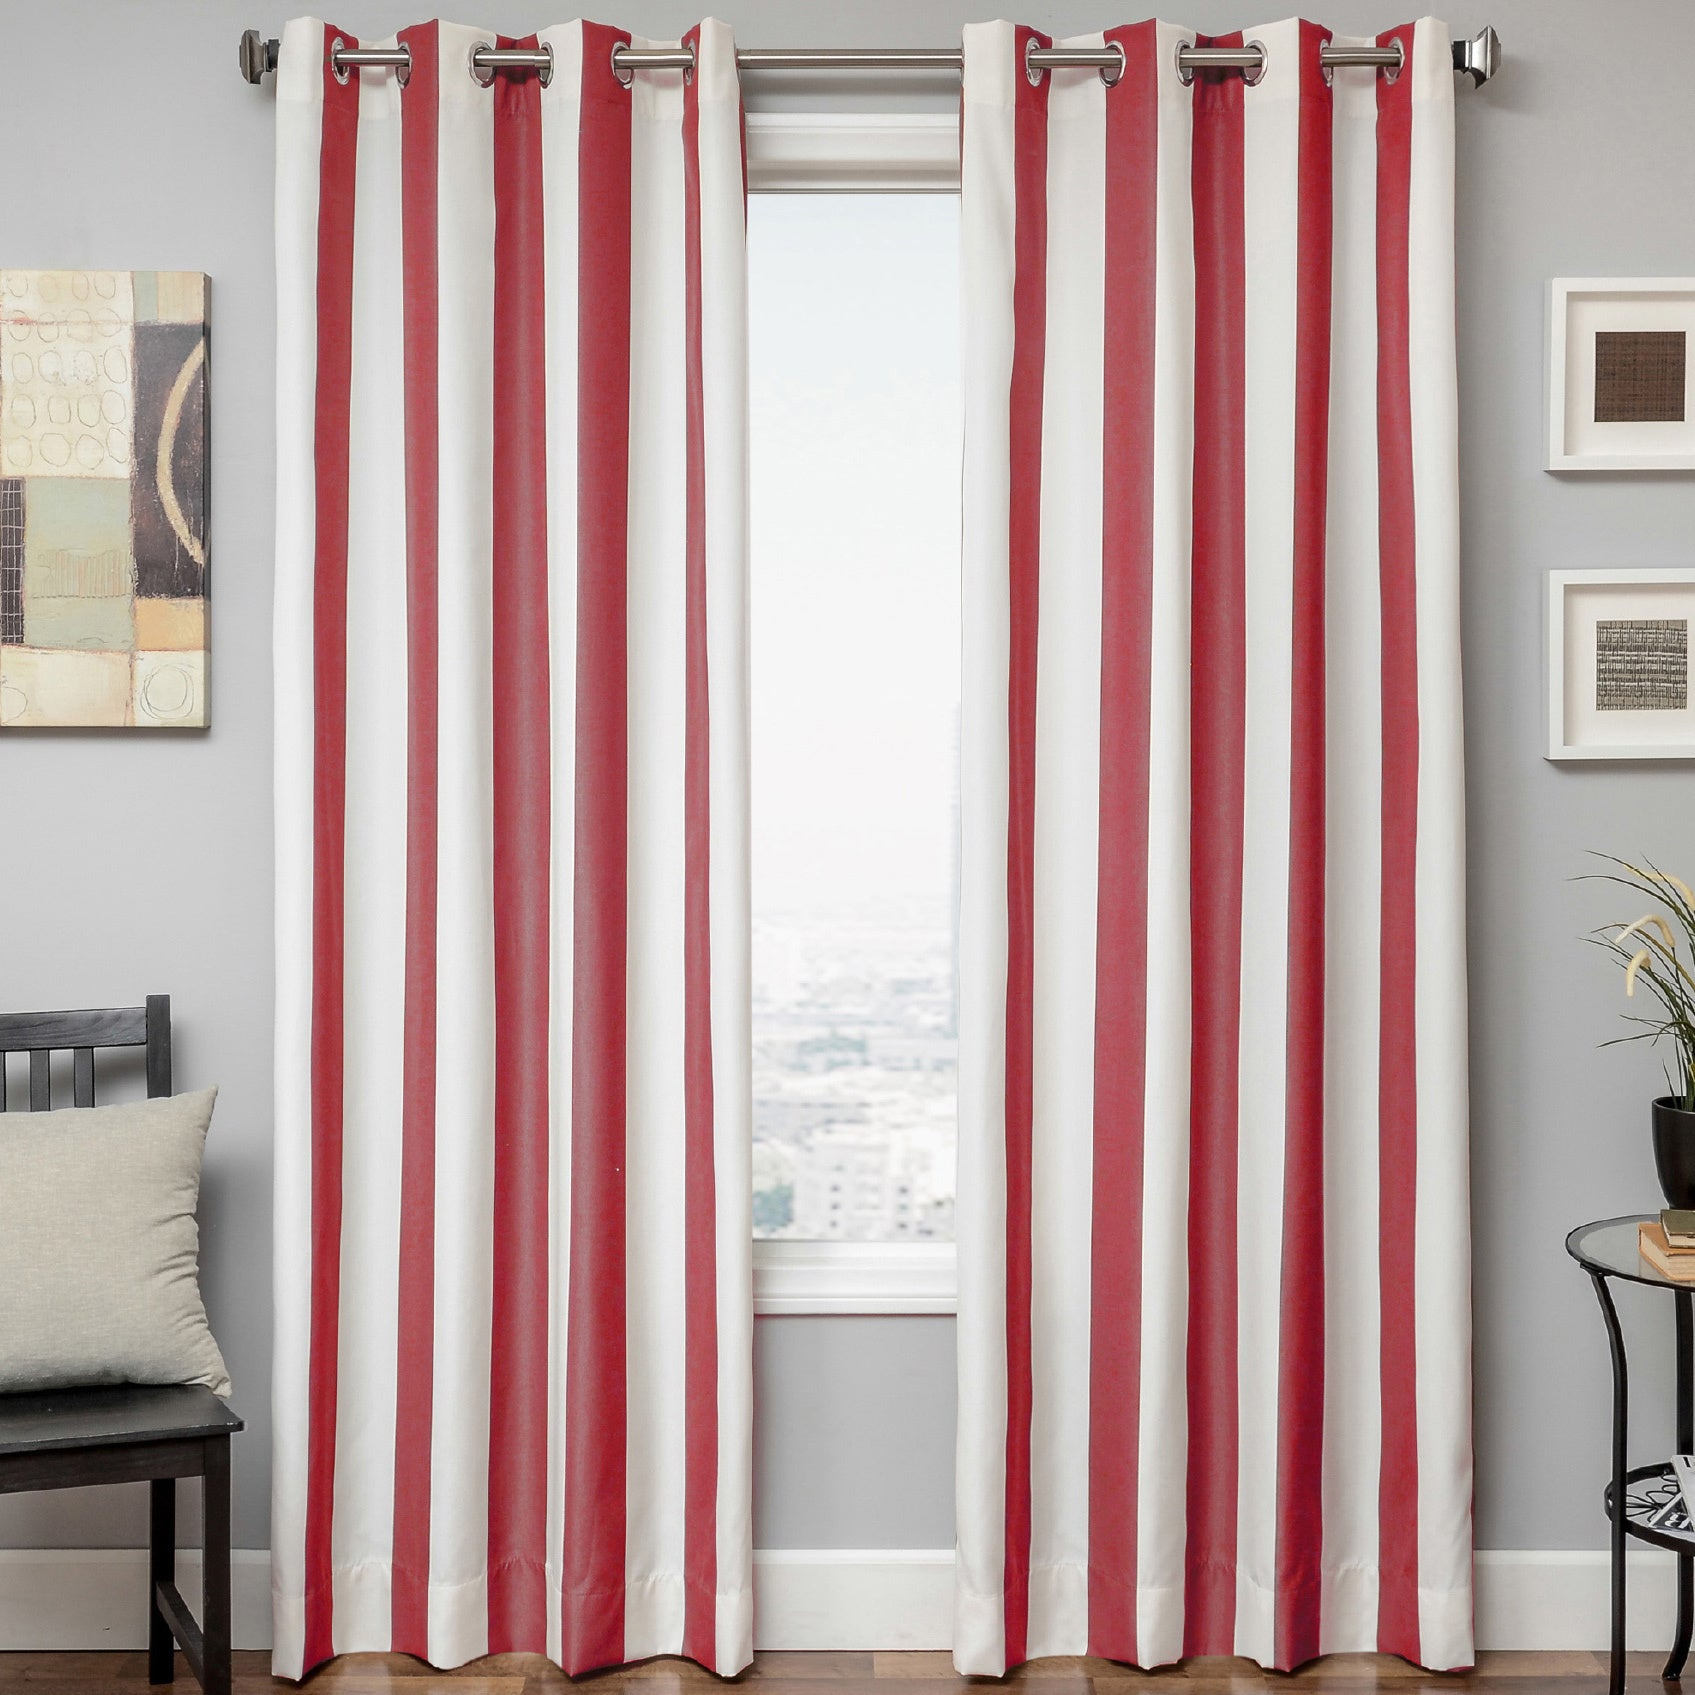 Softline Sunbrella Cabana Stripe Indoor Outdoor Curtain Panel Overstock 8876232